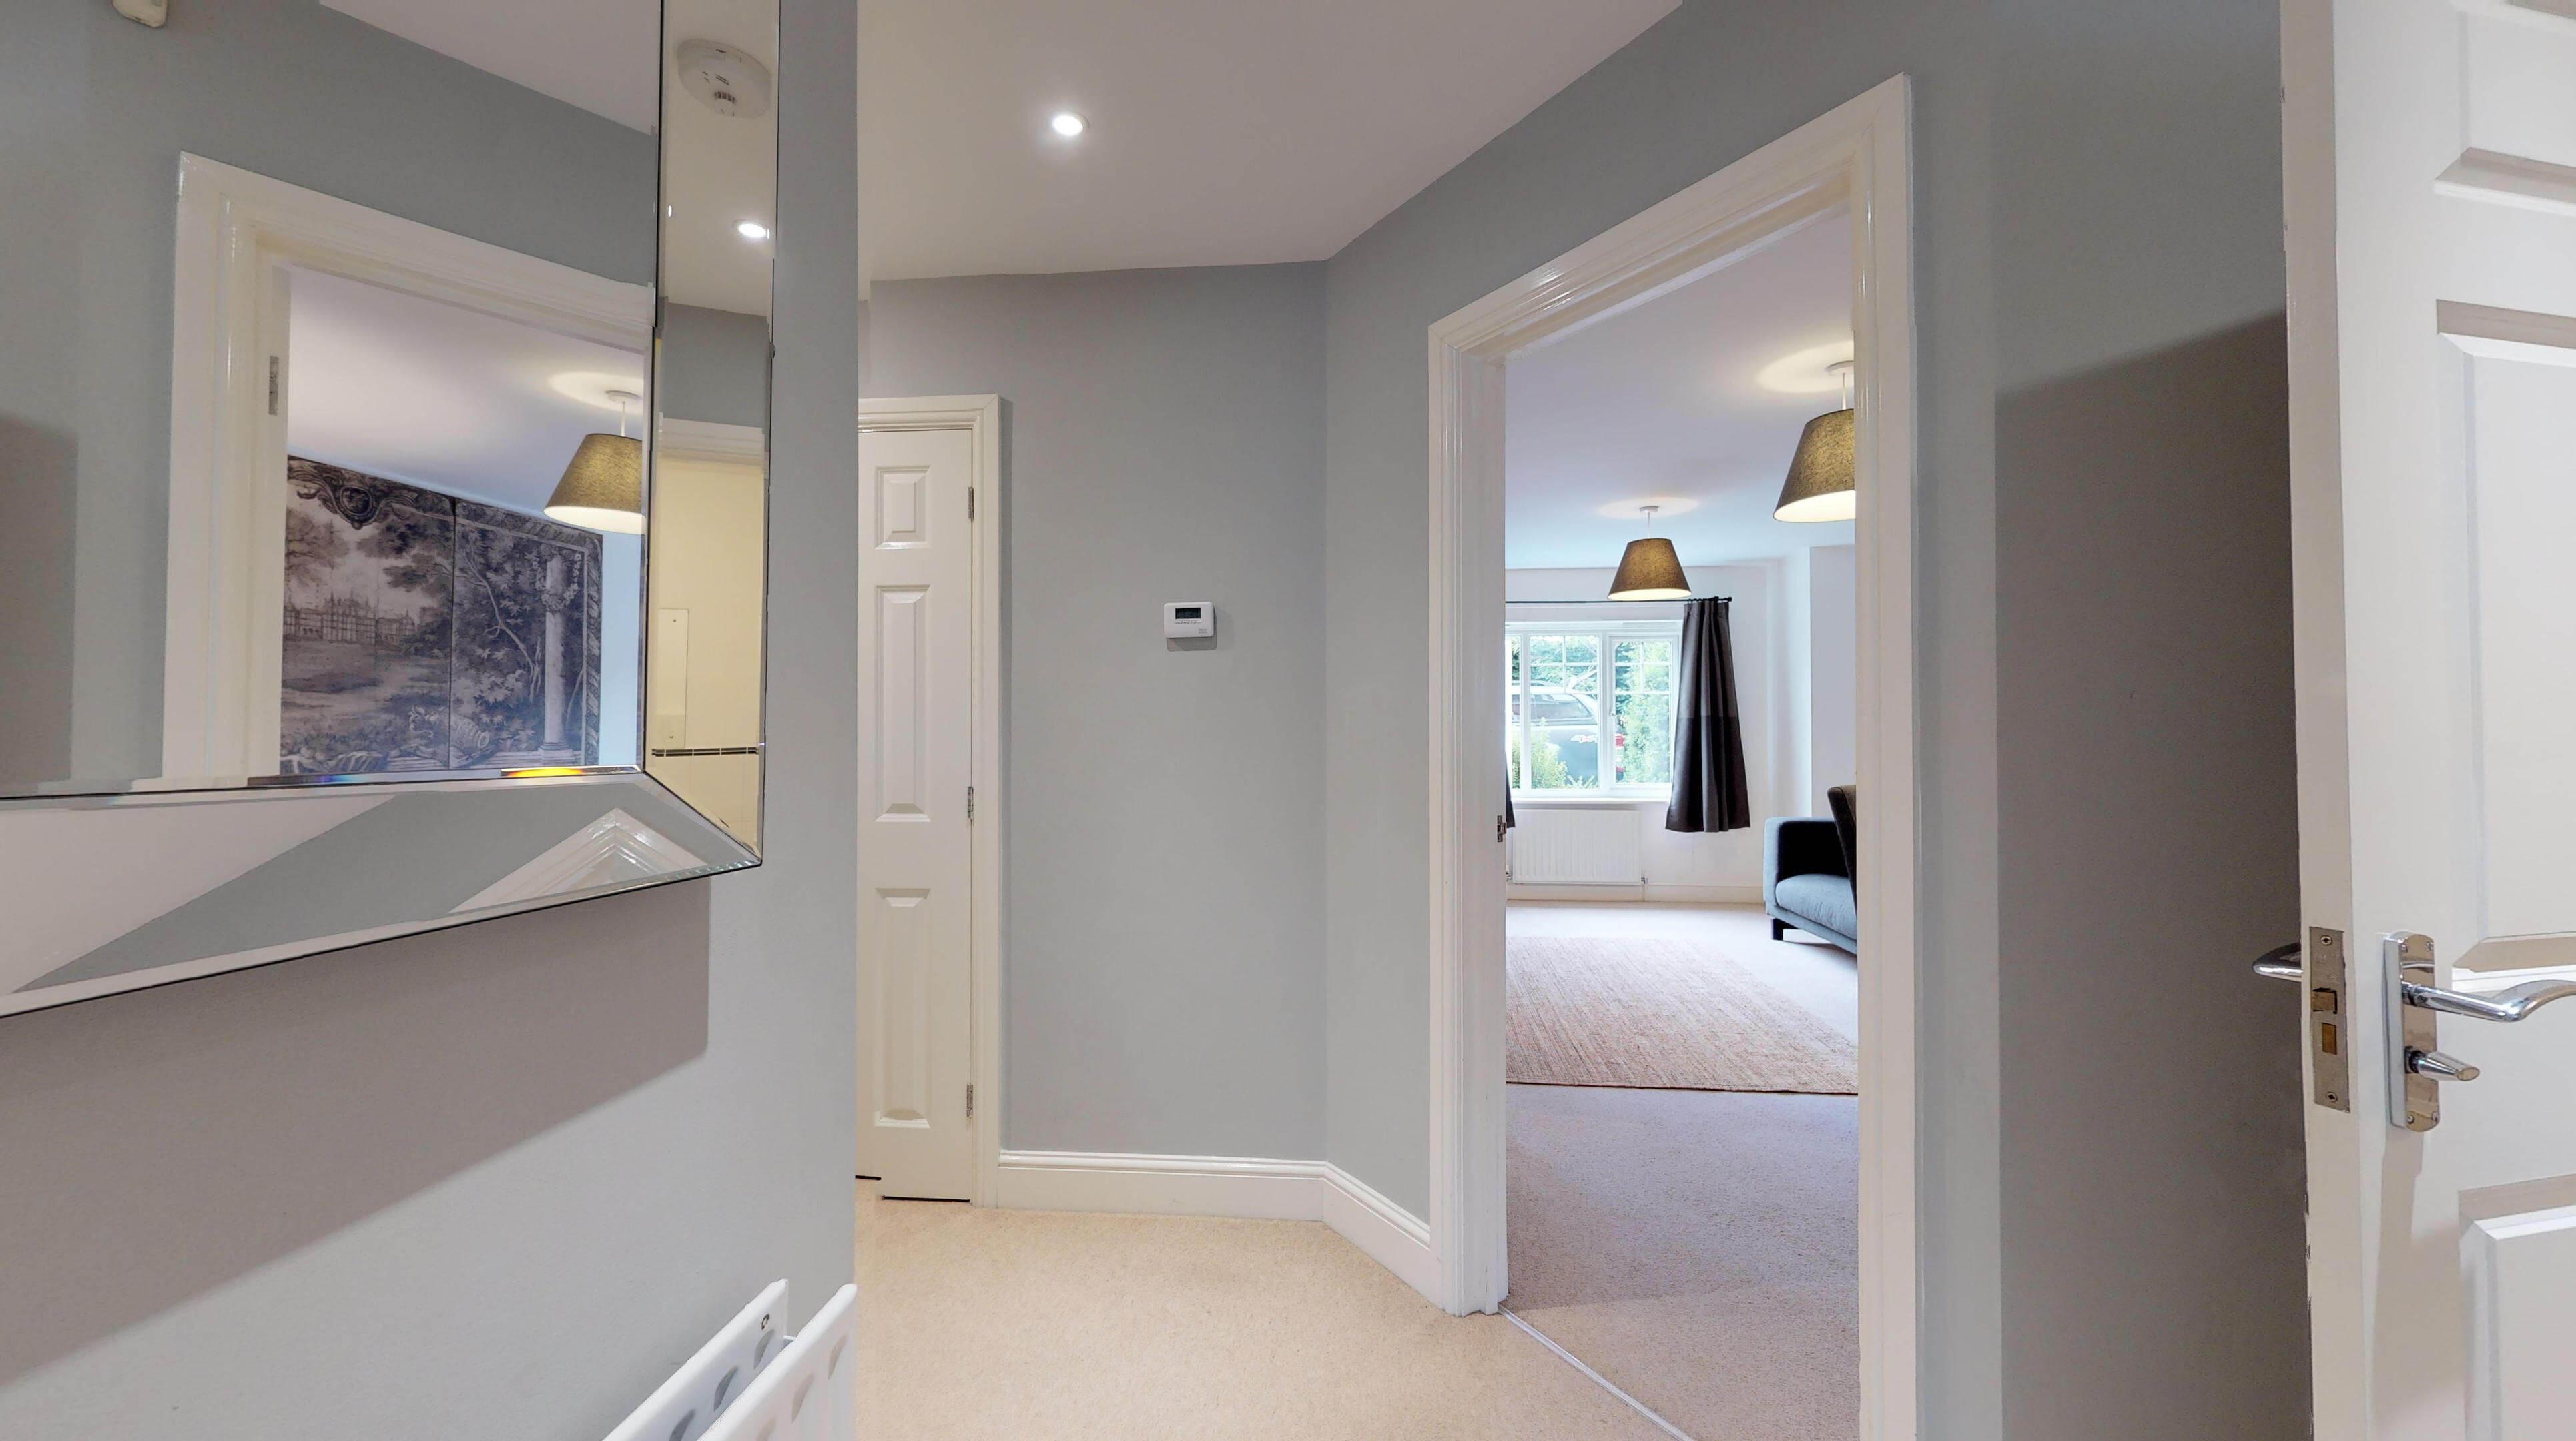 Oxford Serviced Apartments Hensington Suite Hallway